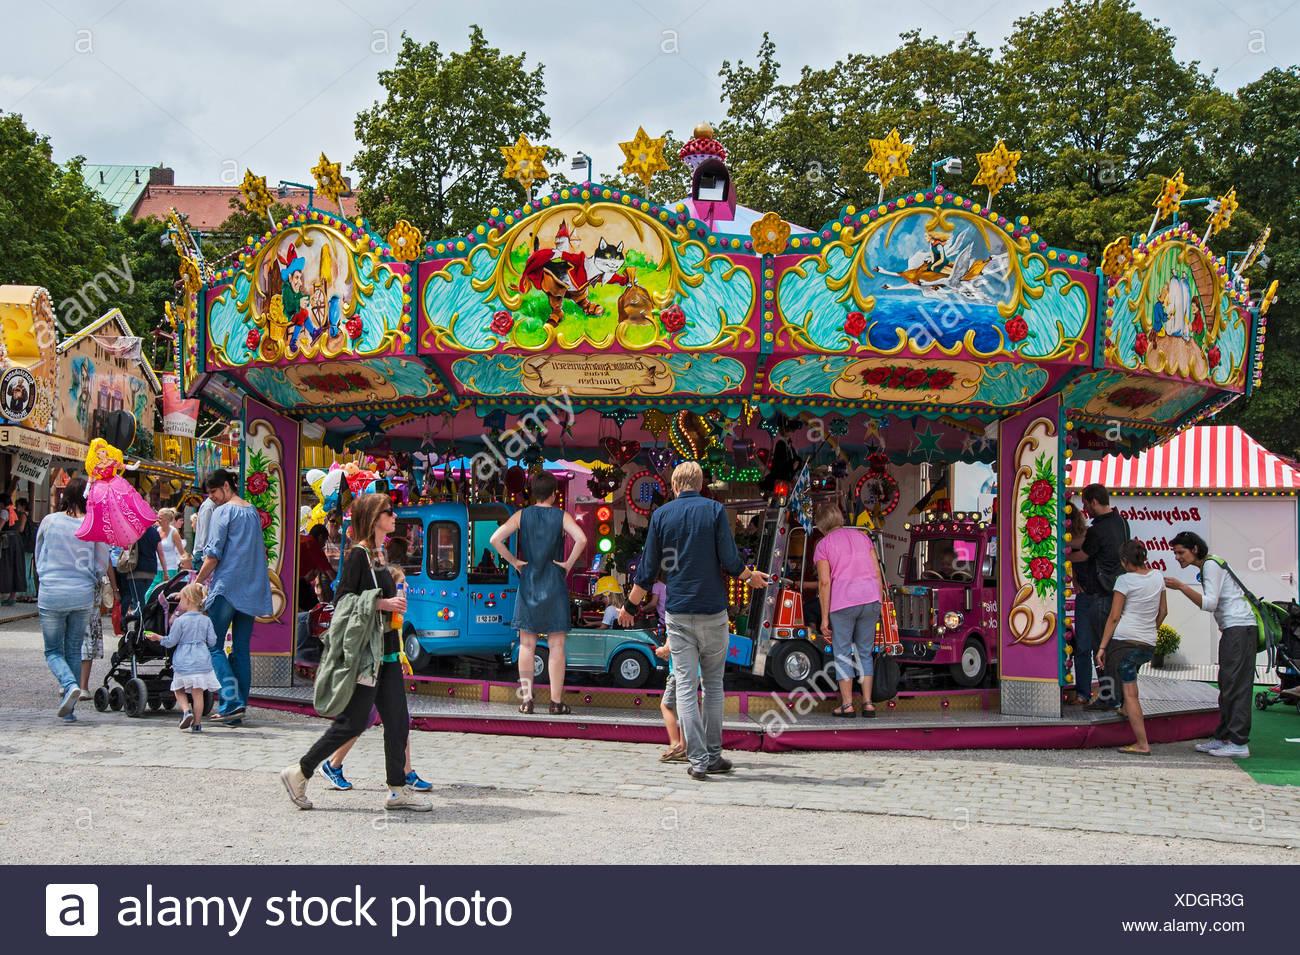 Nostalgische Kinder ' s Karussell, Auer Dult, München, Upper Bavaria, Bavaria, Germany Stockbild